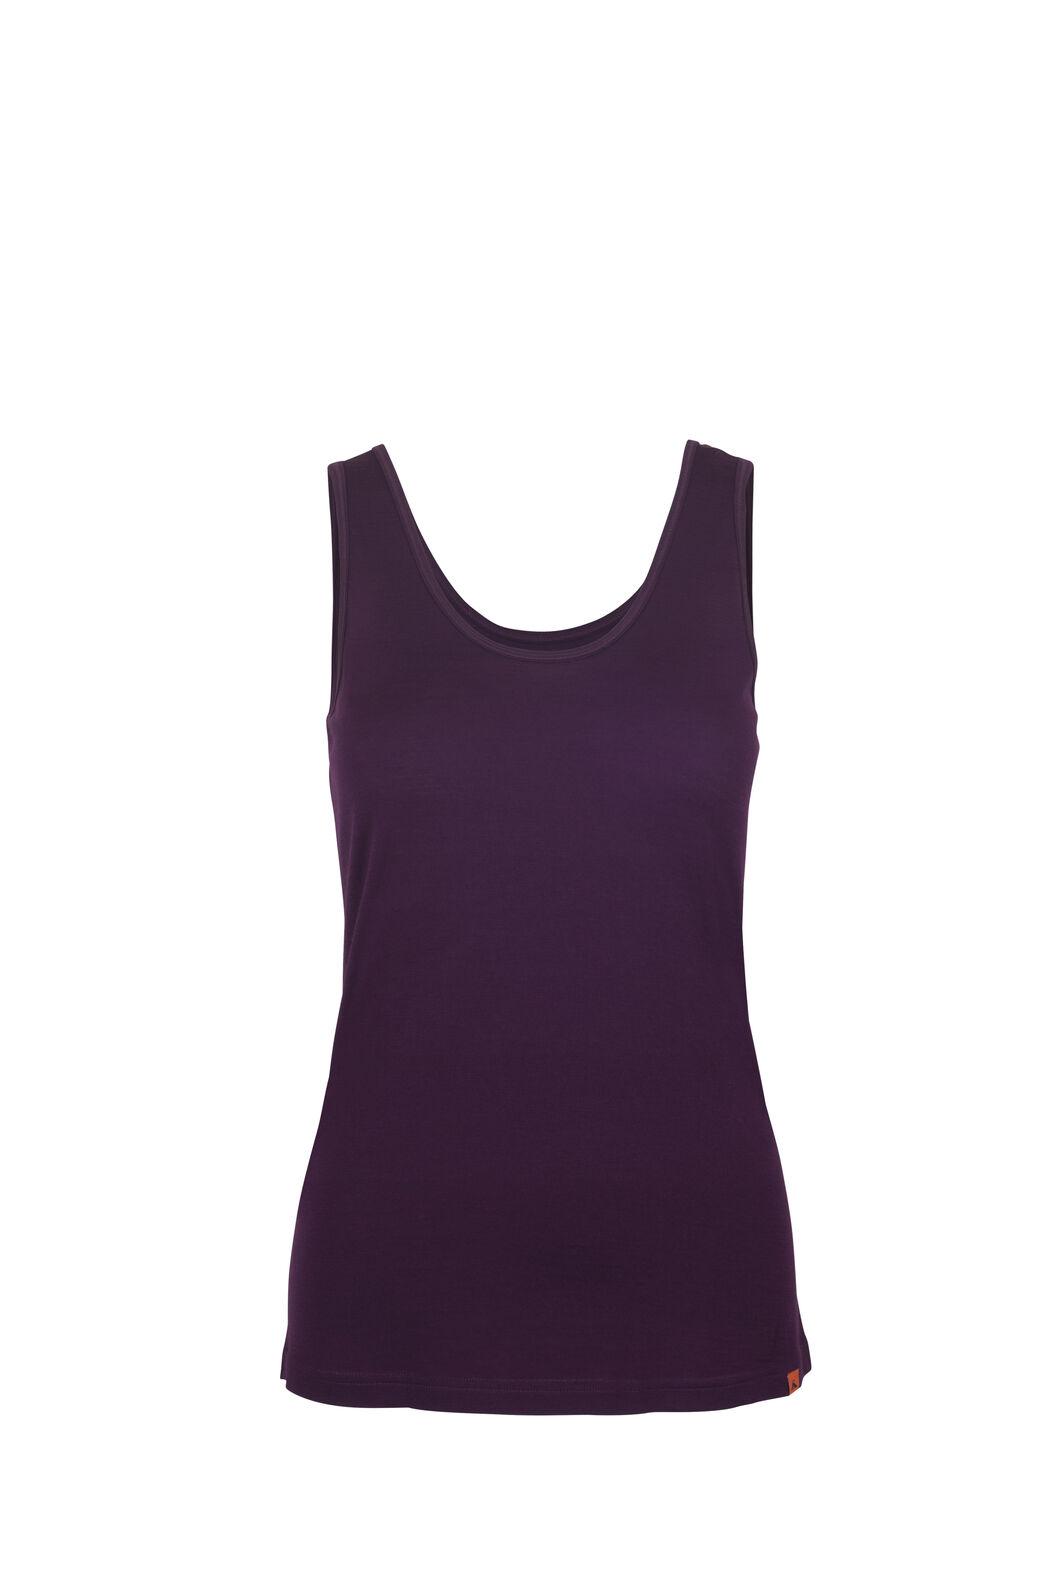 Macpac 150 Merino Singlet - Women's, Potent Purple, hi-res